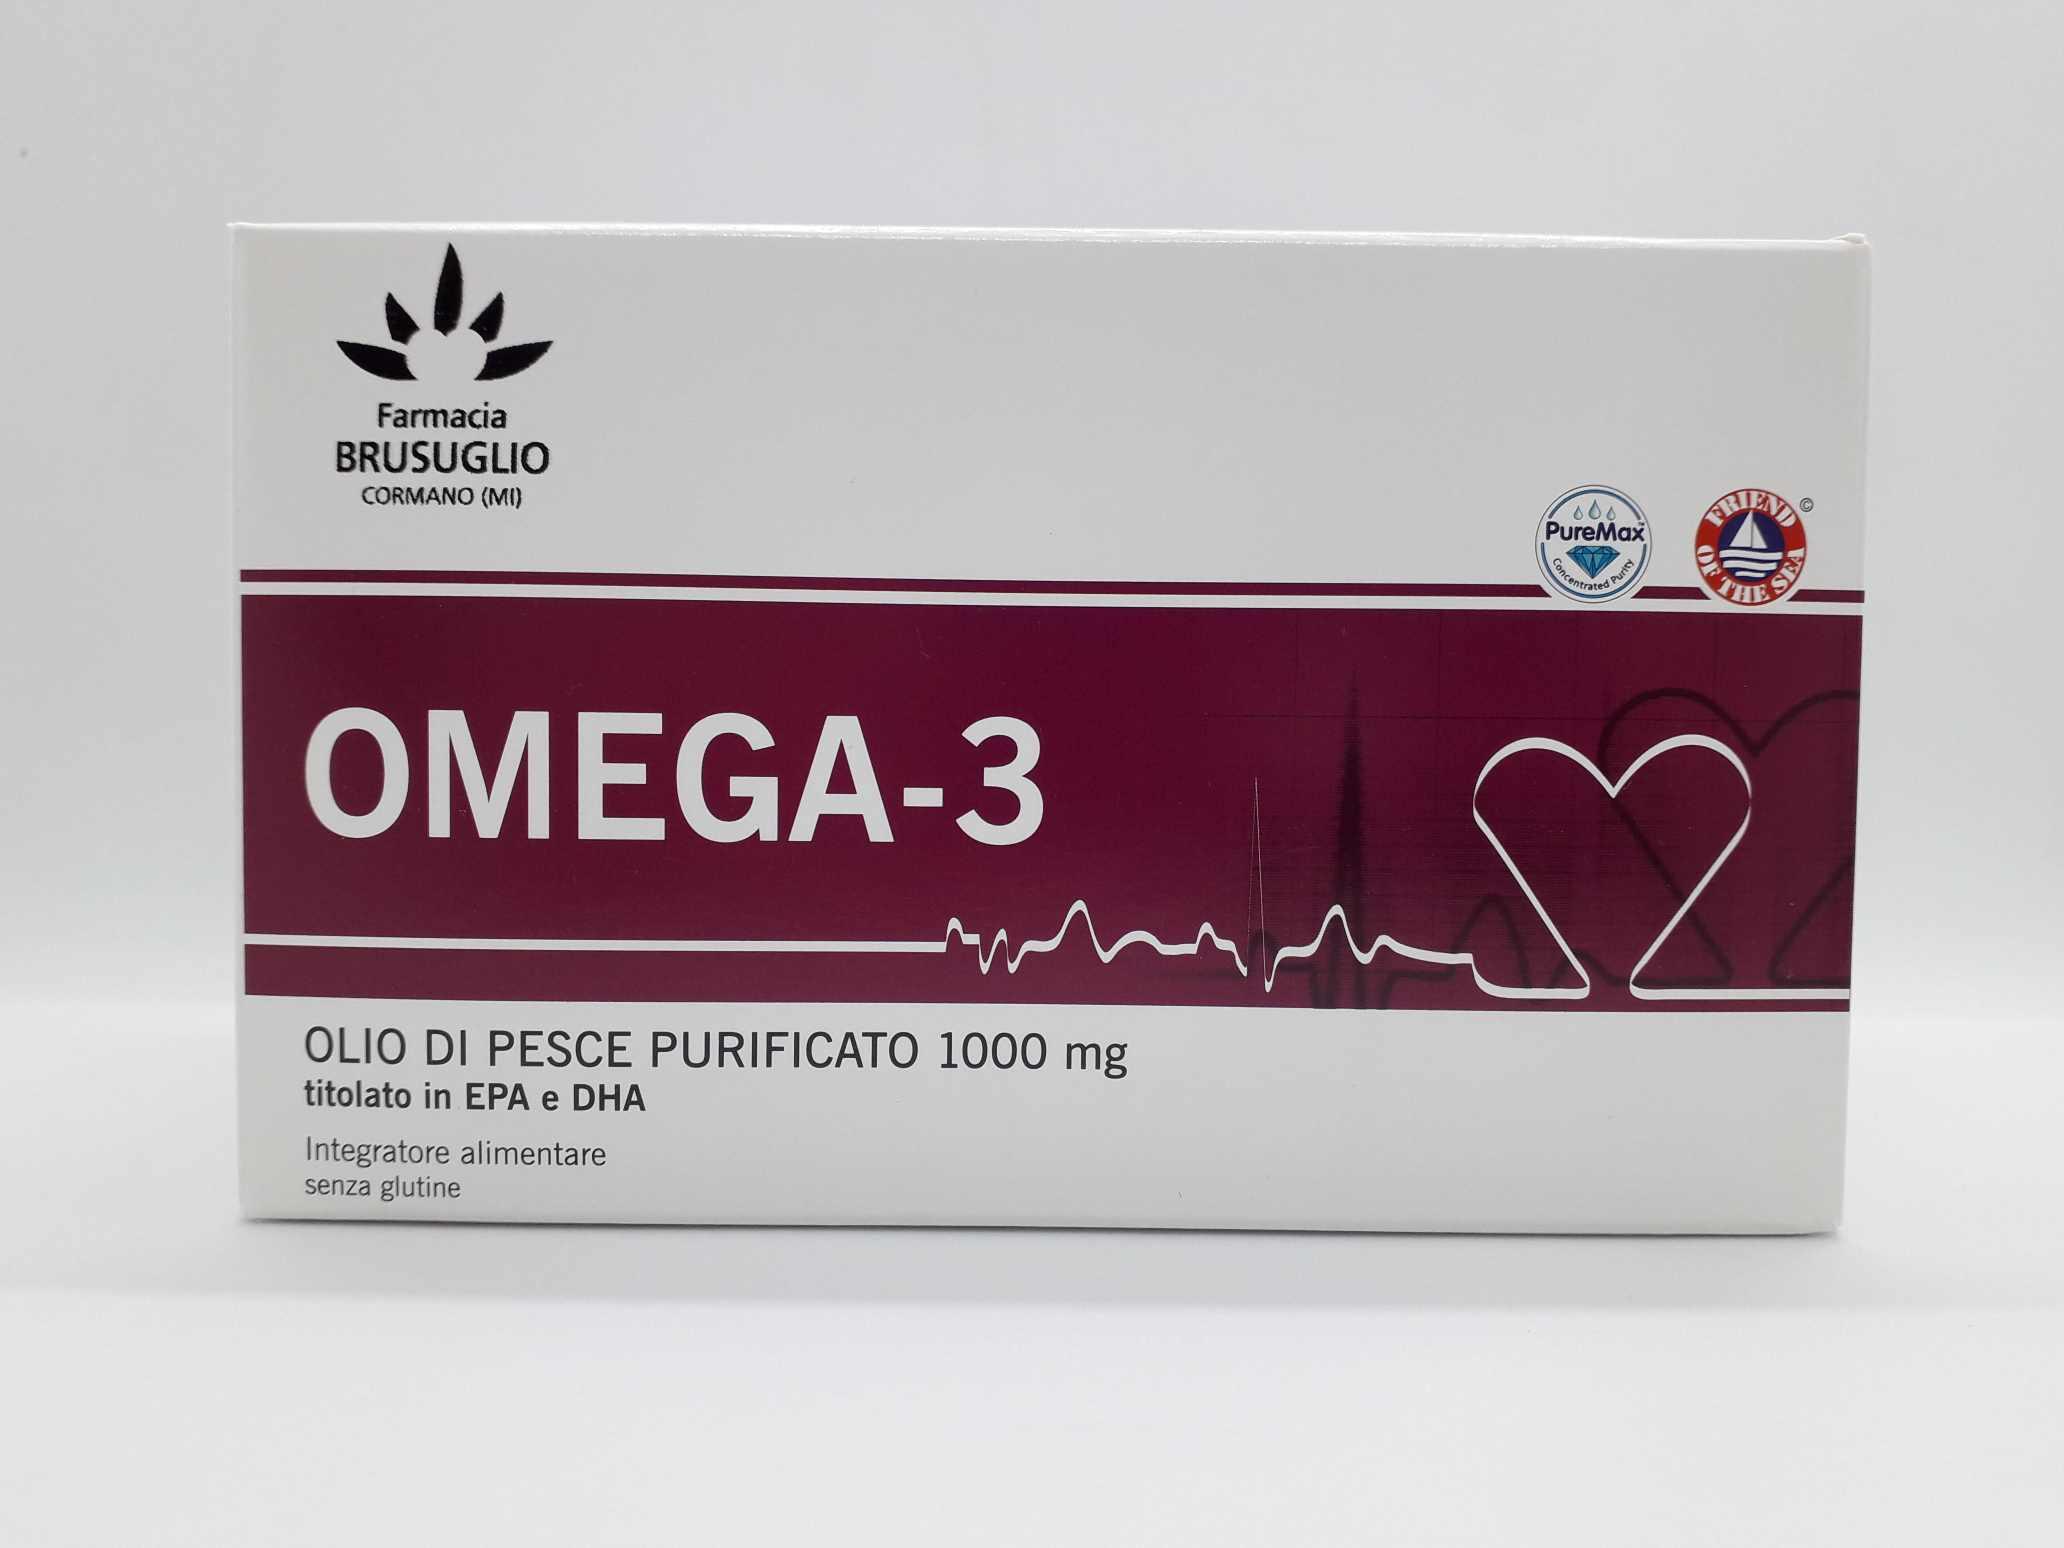 LFP OMEGA3 90 CAPSULE - Farmaciaempatica.it